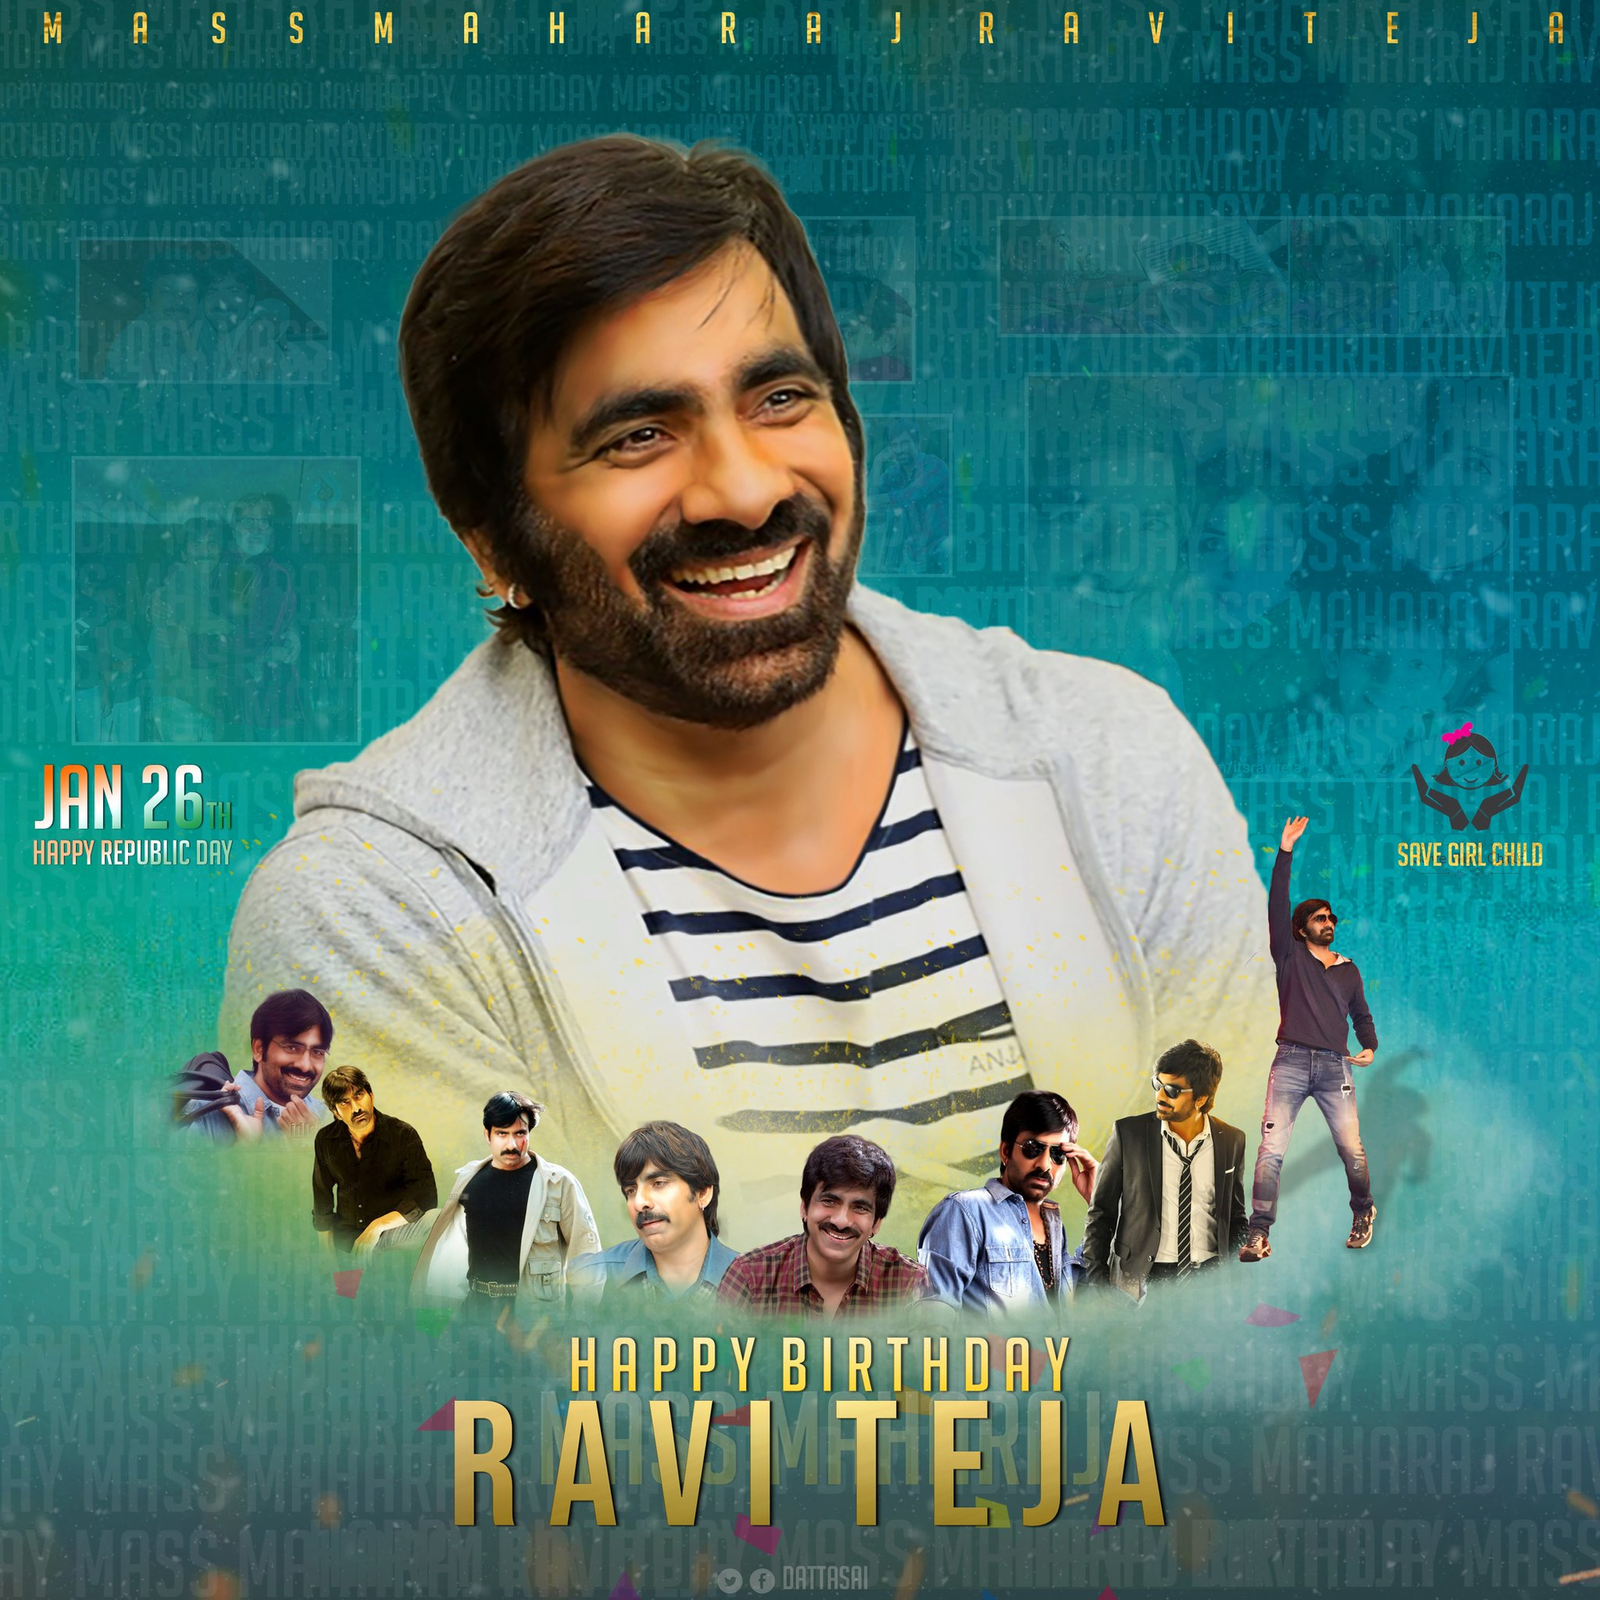 Ravi Teja Birthday Common Dp Social News Xyz Ravi Teja Movies Movie Posters